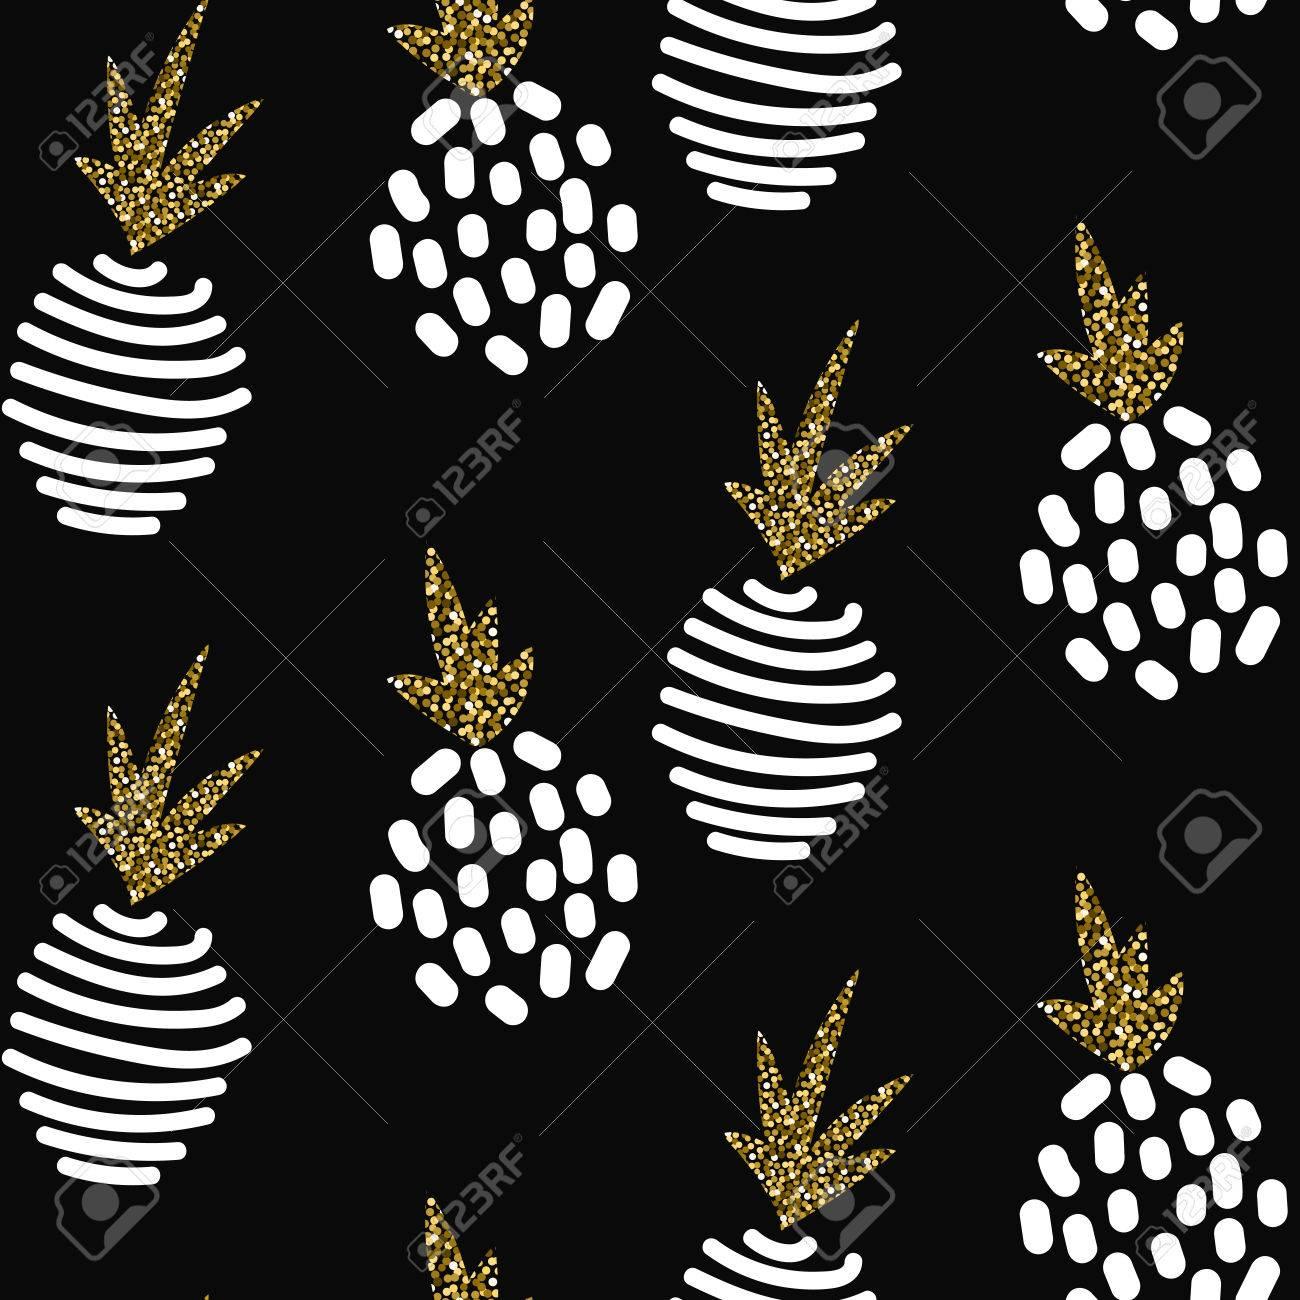 Glitter scandinavian striped pineapple ornament. Vector black gold seamless pattern collection. Modern shimmer details stylish texture. - 55365693